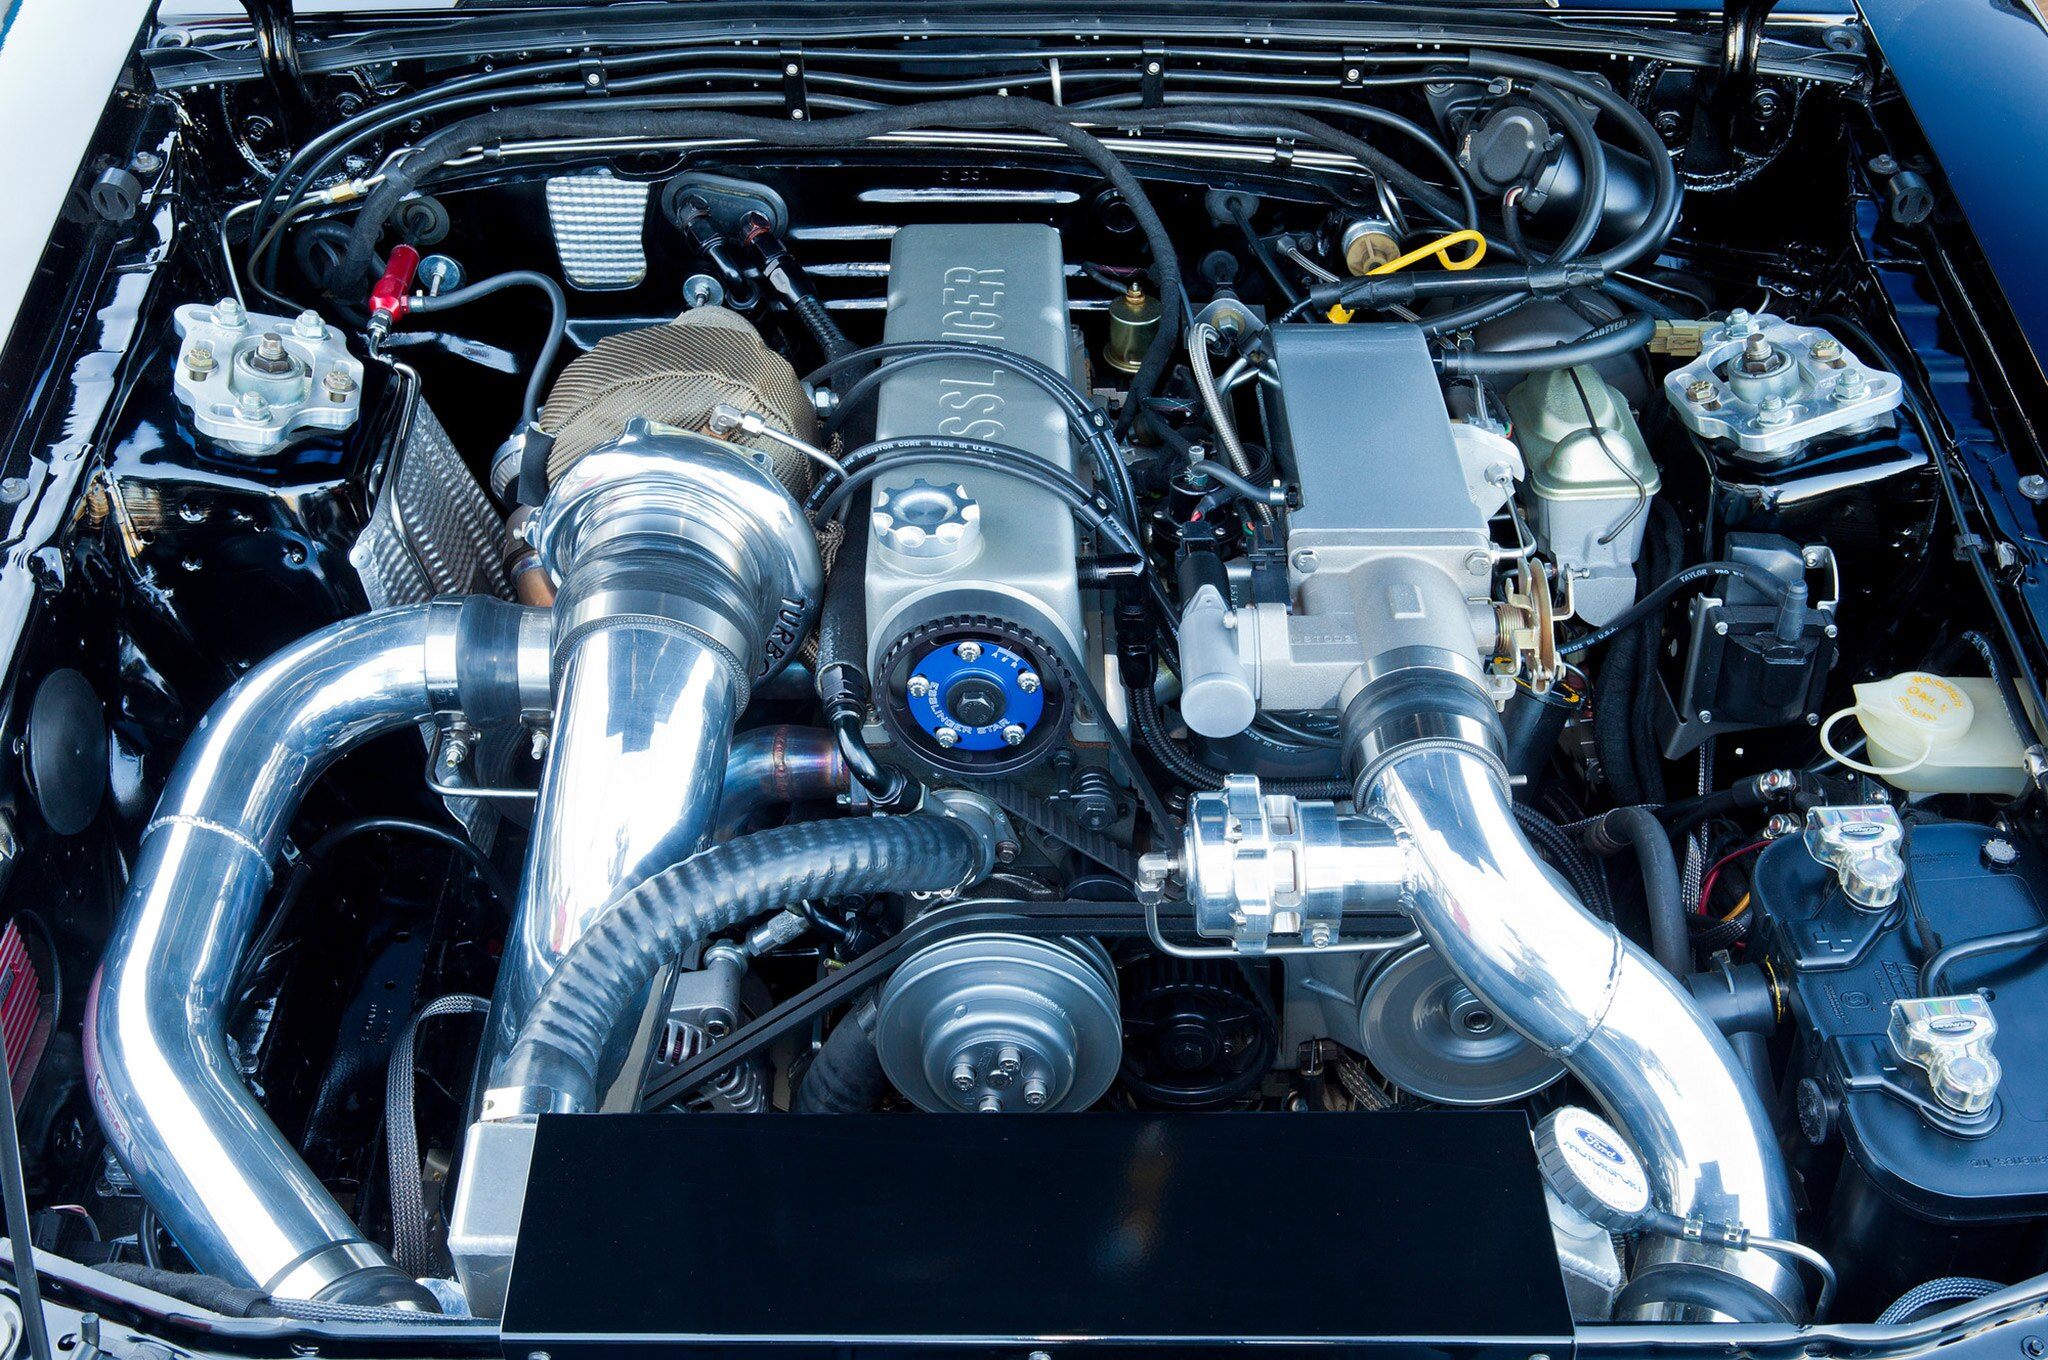 1986 Ford Mustang Svo 06